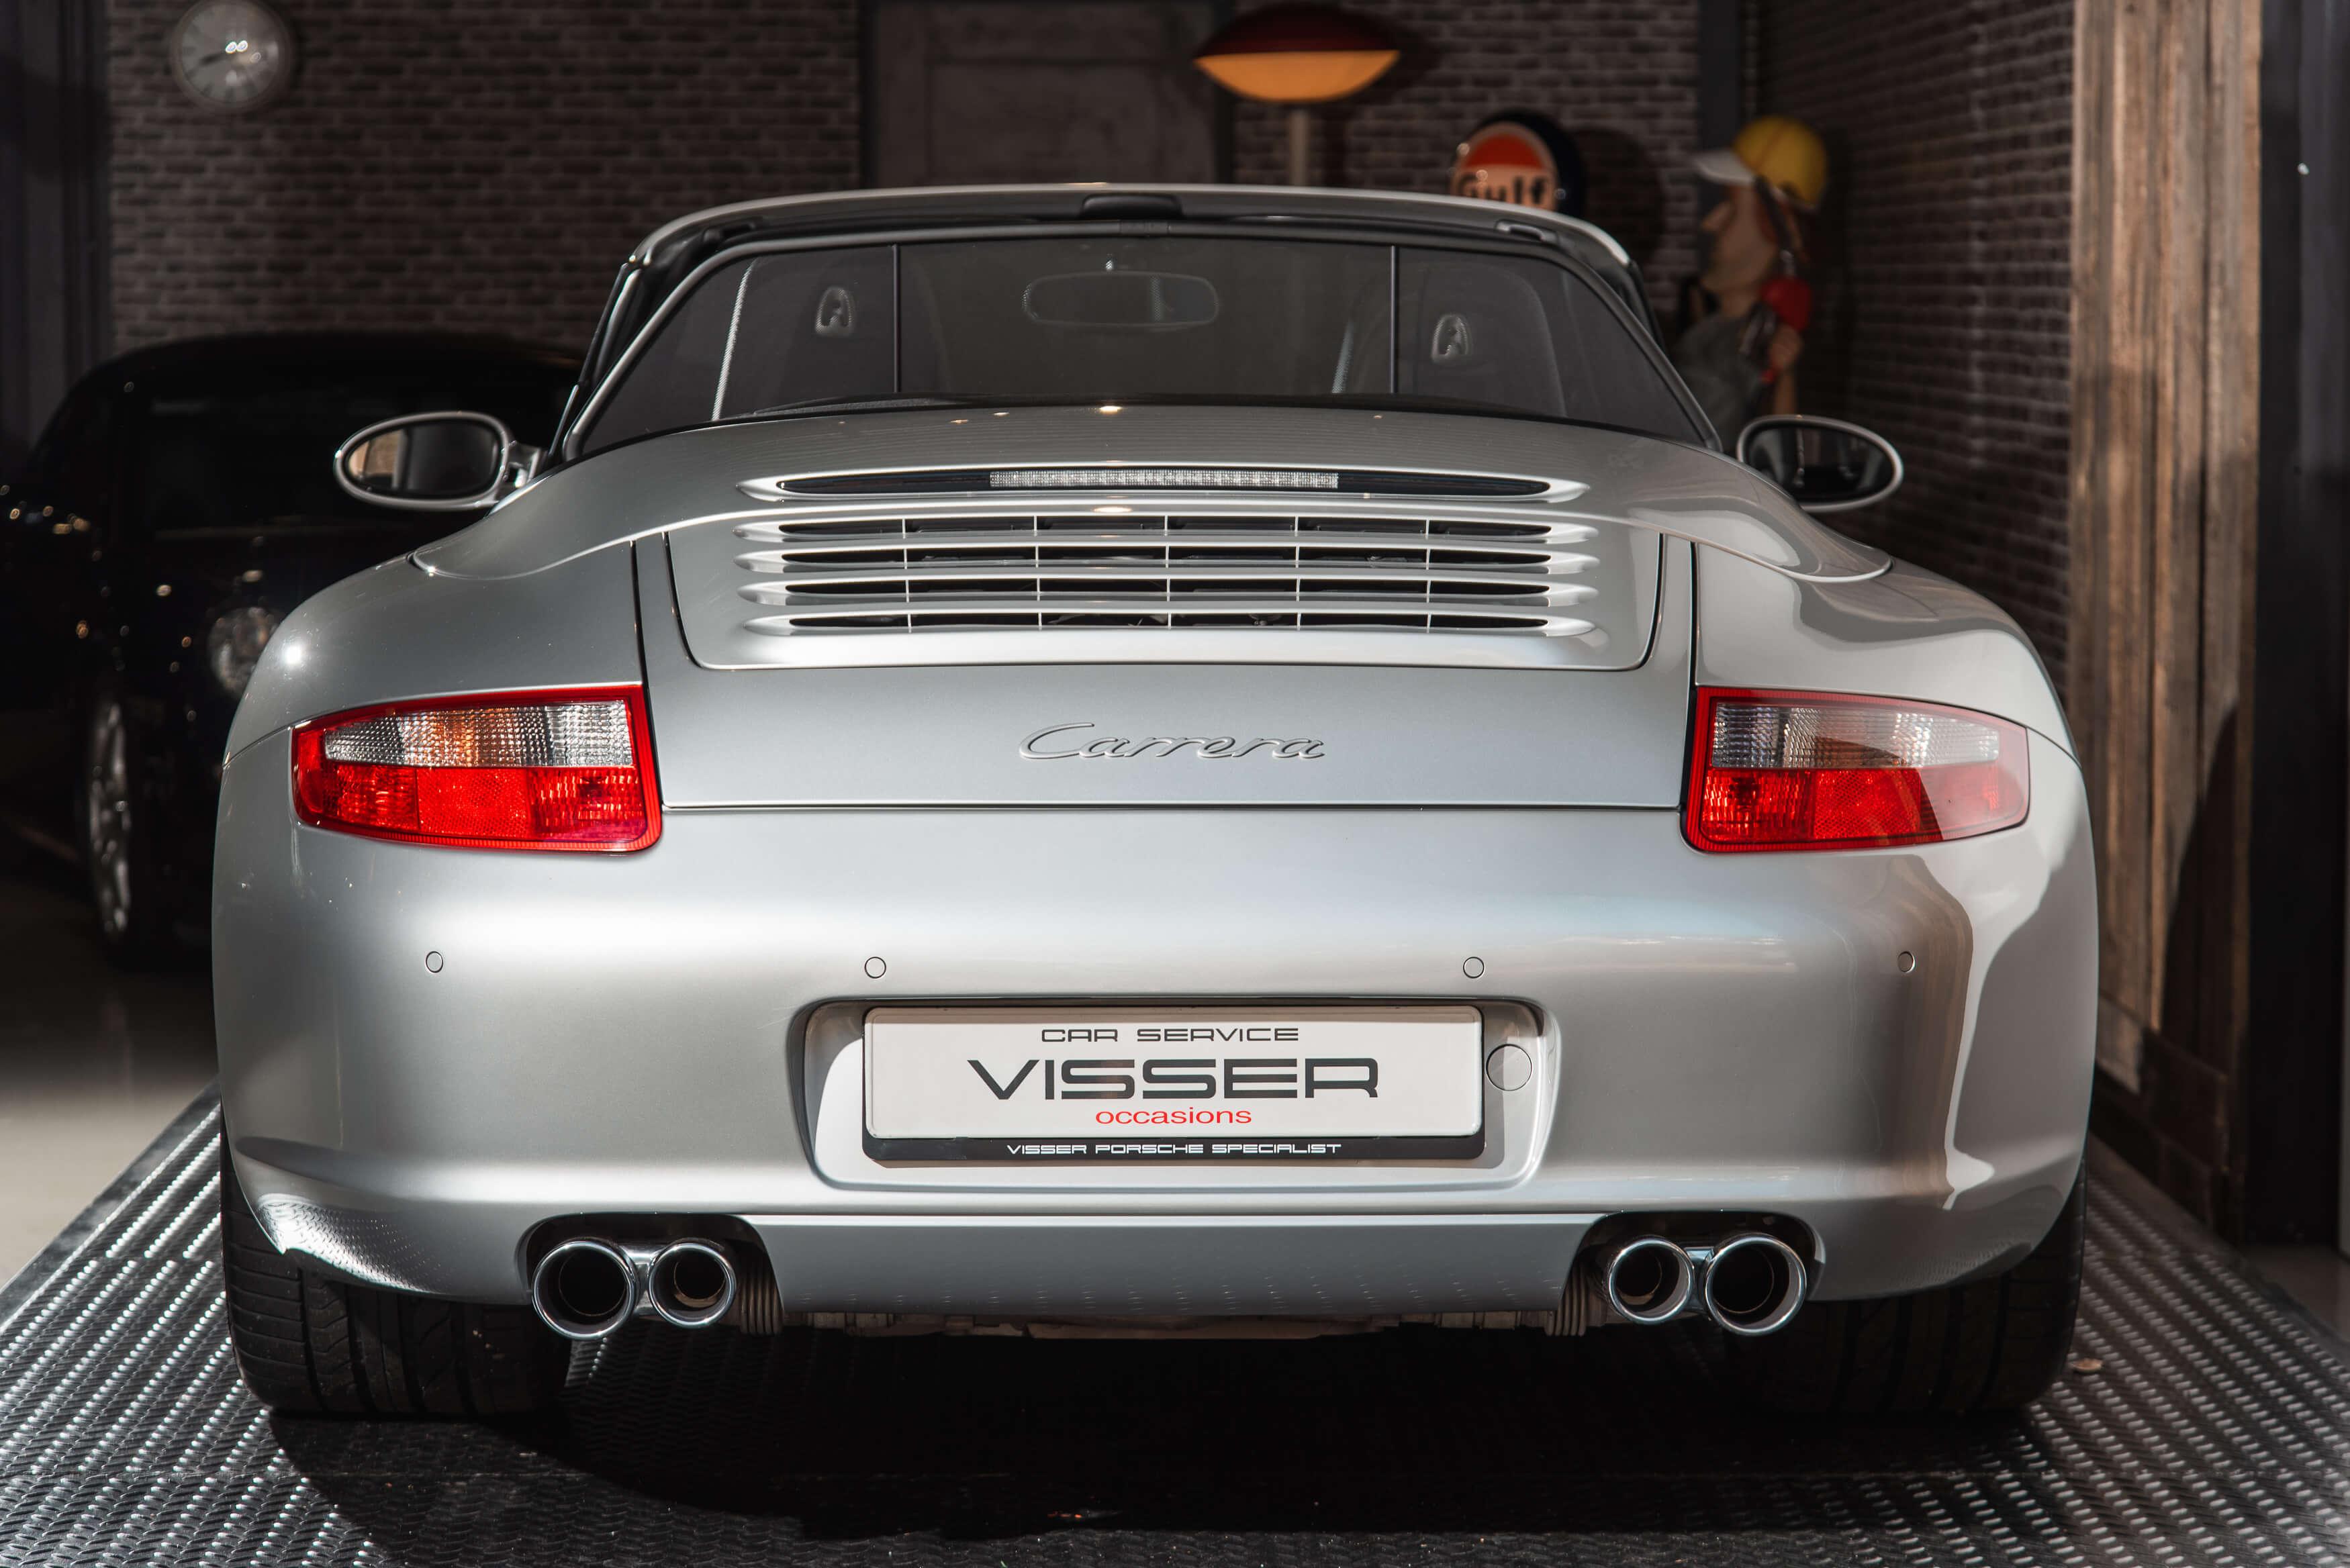 Porsche 997 Carrera 2 automaat Car Service Visser gespecialiseerd in Porsche - 5